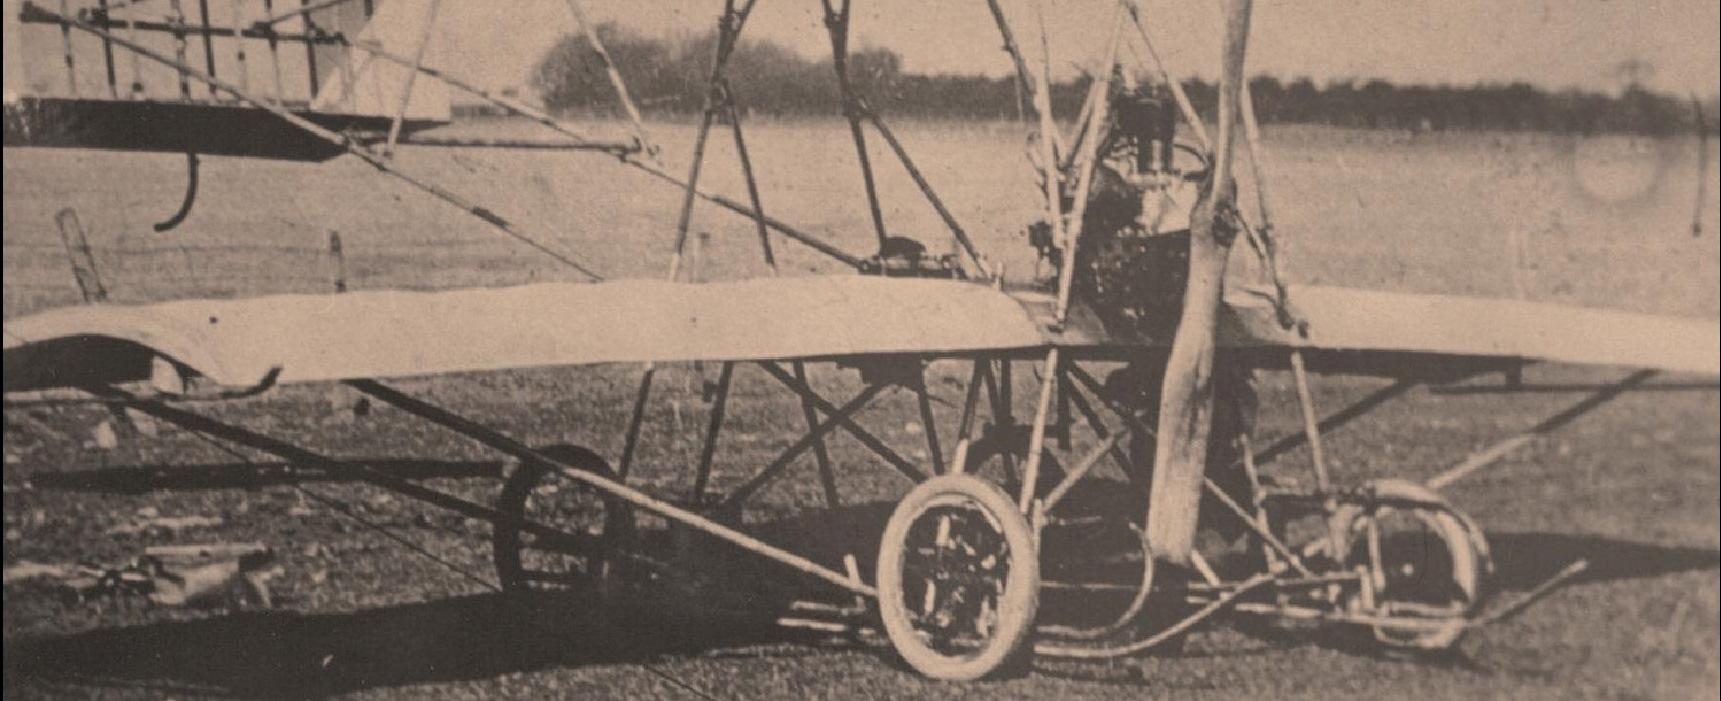 Preston Watson: Dundee's Pioneer Aviator